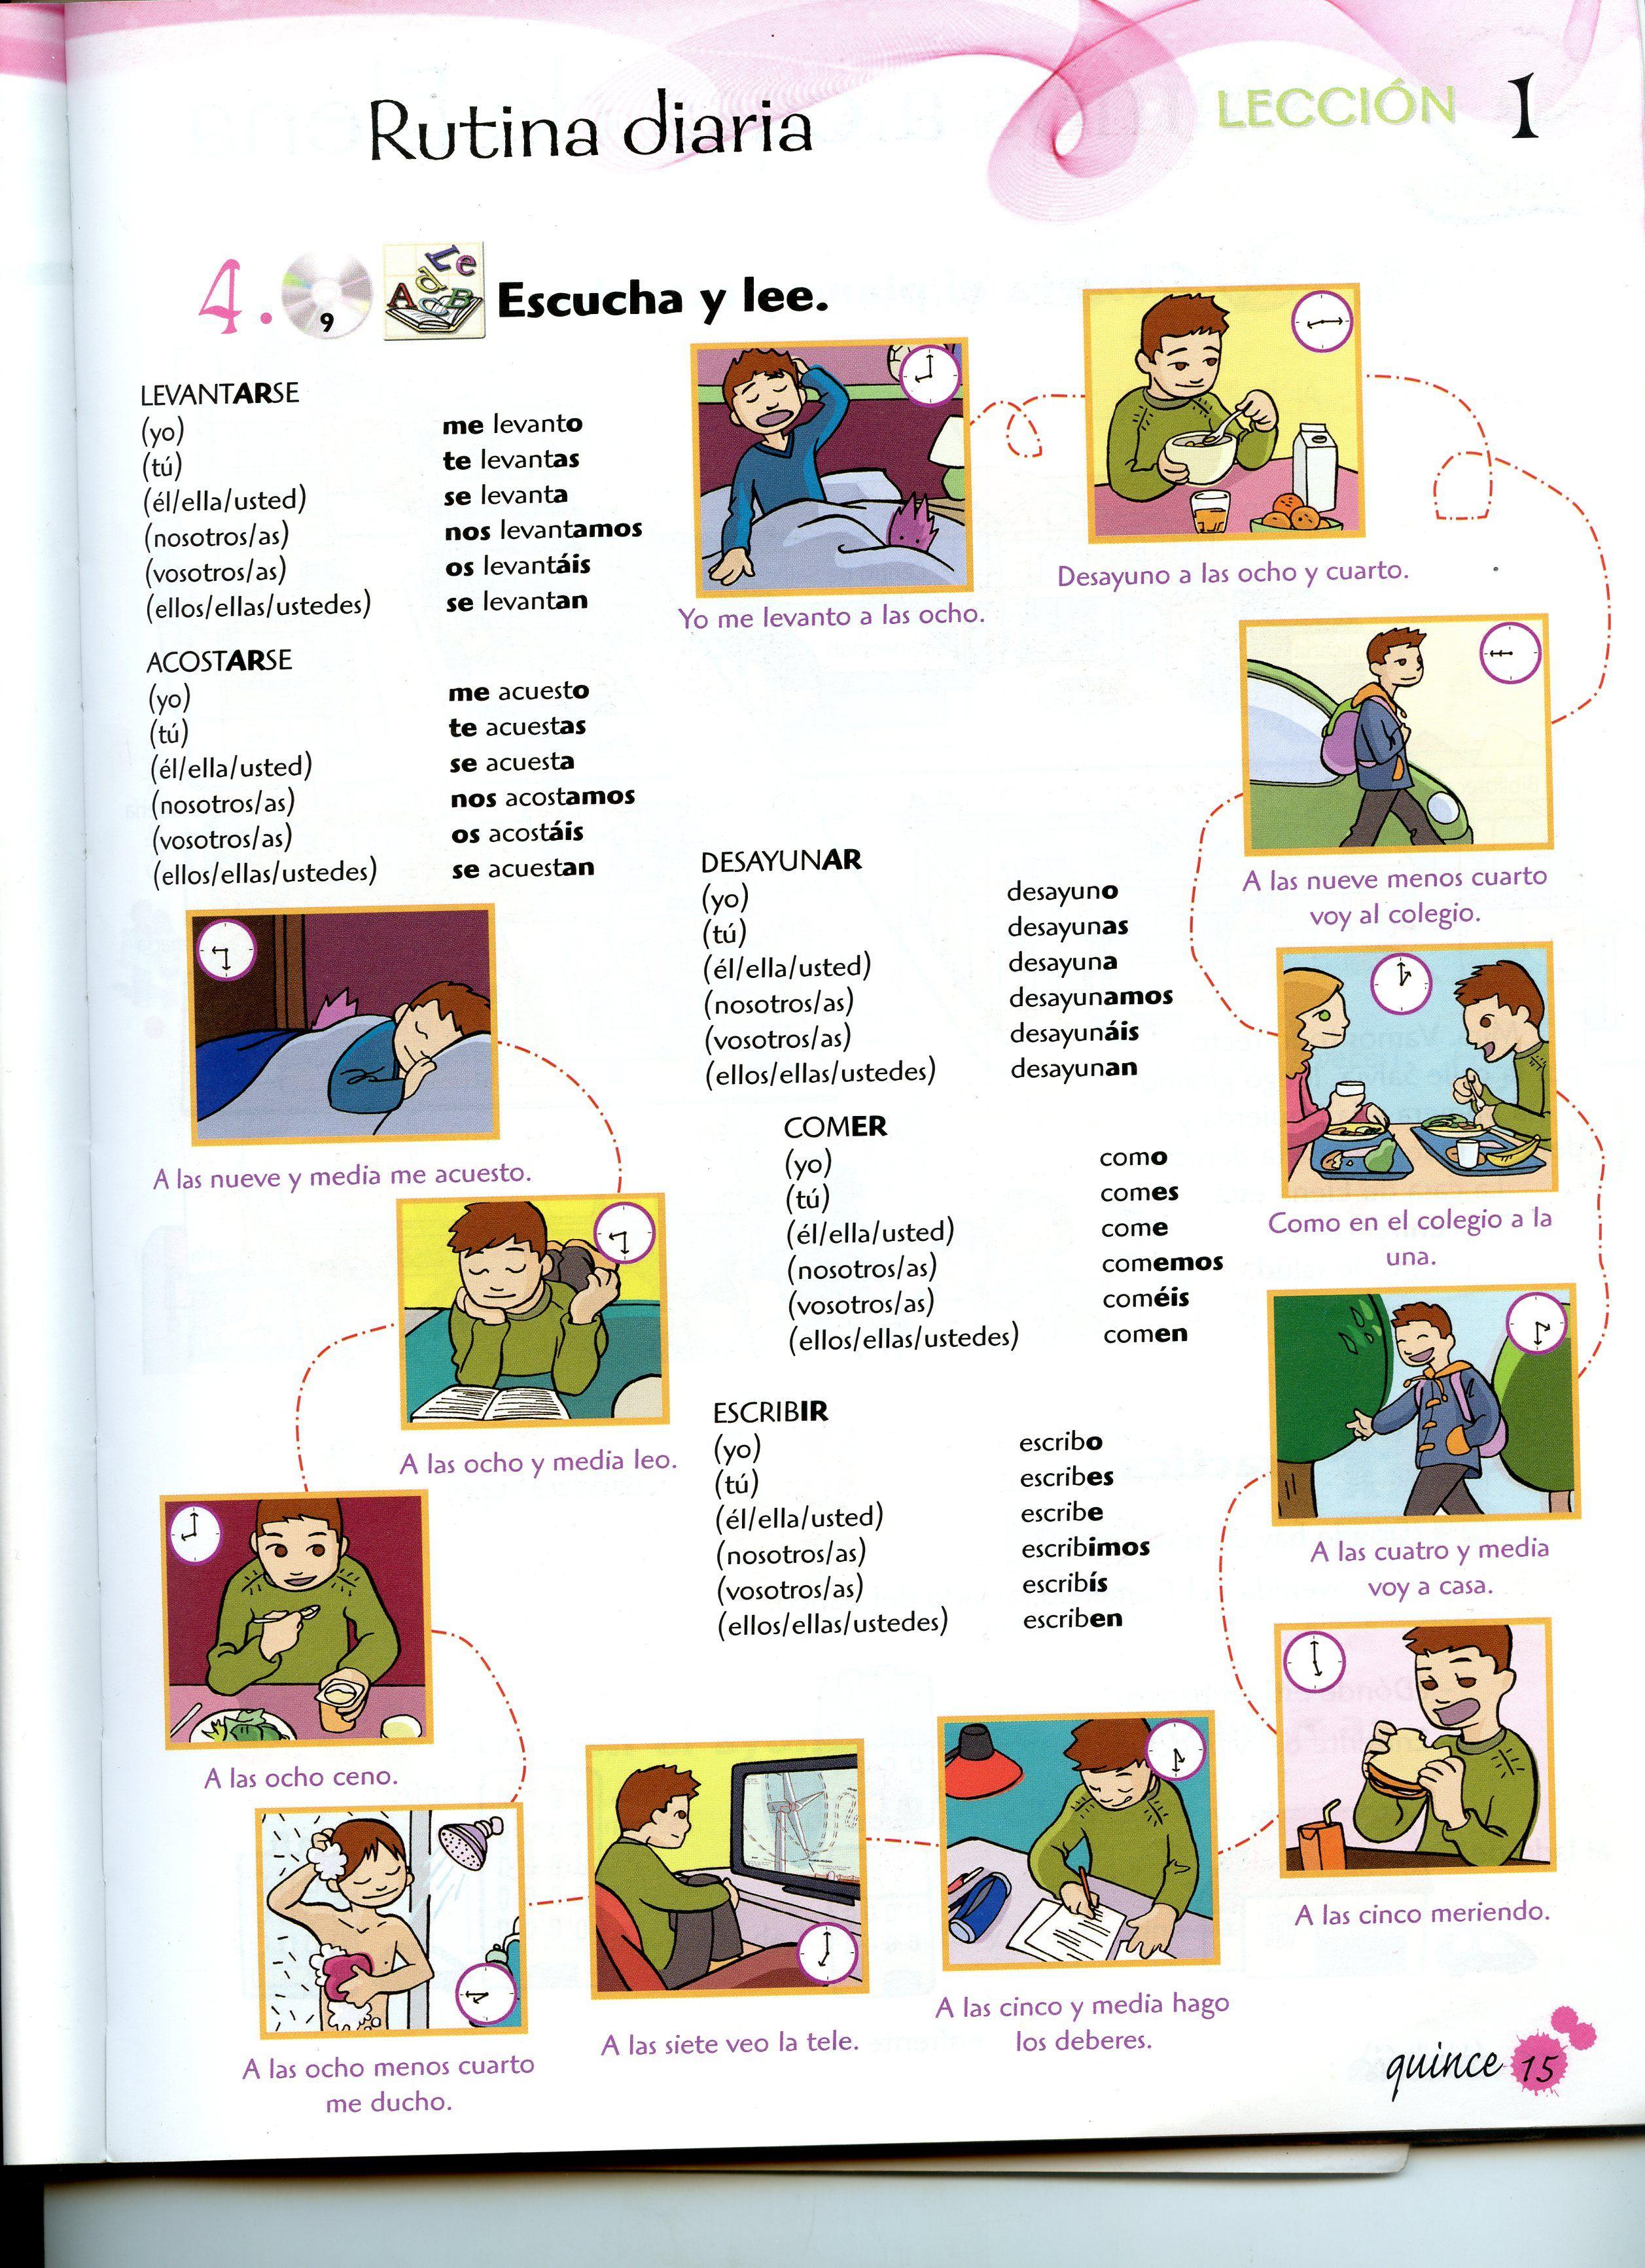 los verbos de la rutina diaria muy completo la rutina diaria pinterest spanish teaching. Black Bedroom Furniture Sets. Home Design Ideas